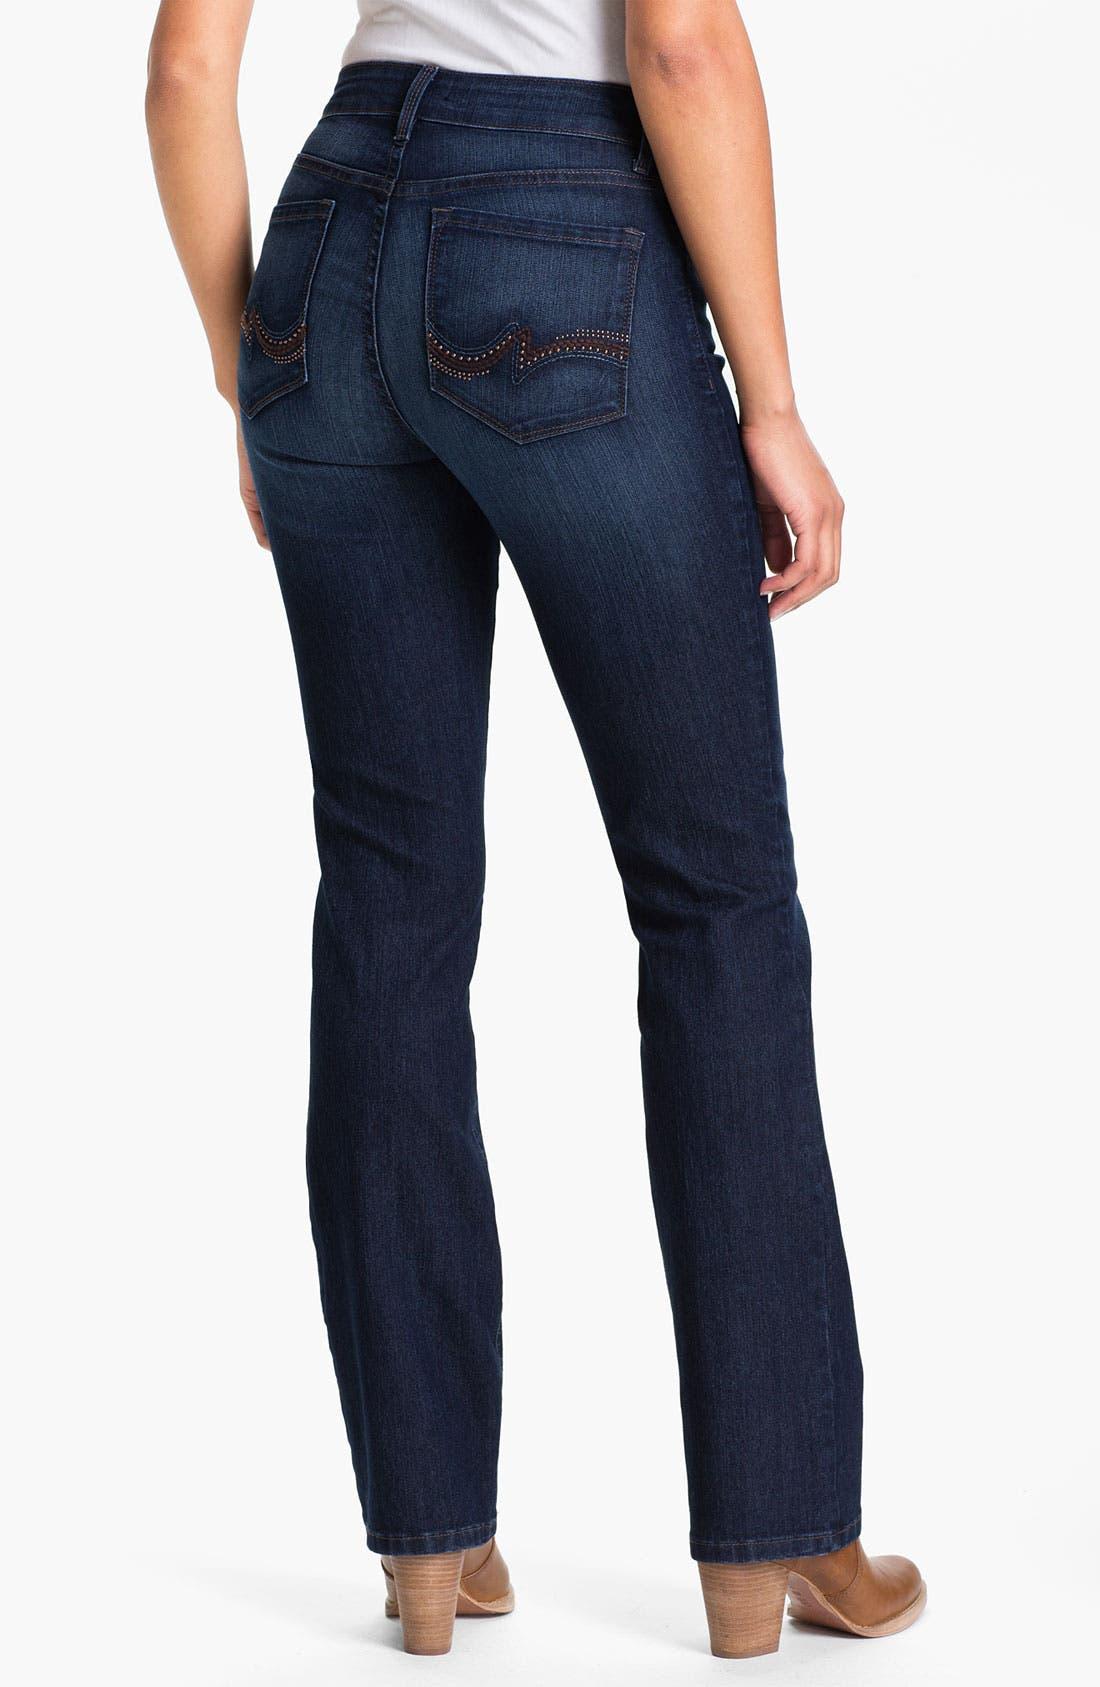 Alternate Image 1 Selected - NYDJ 'Barbara' Embellished Bootcut Jeans